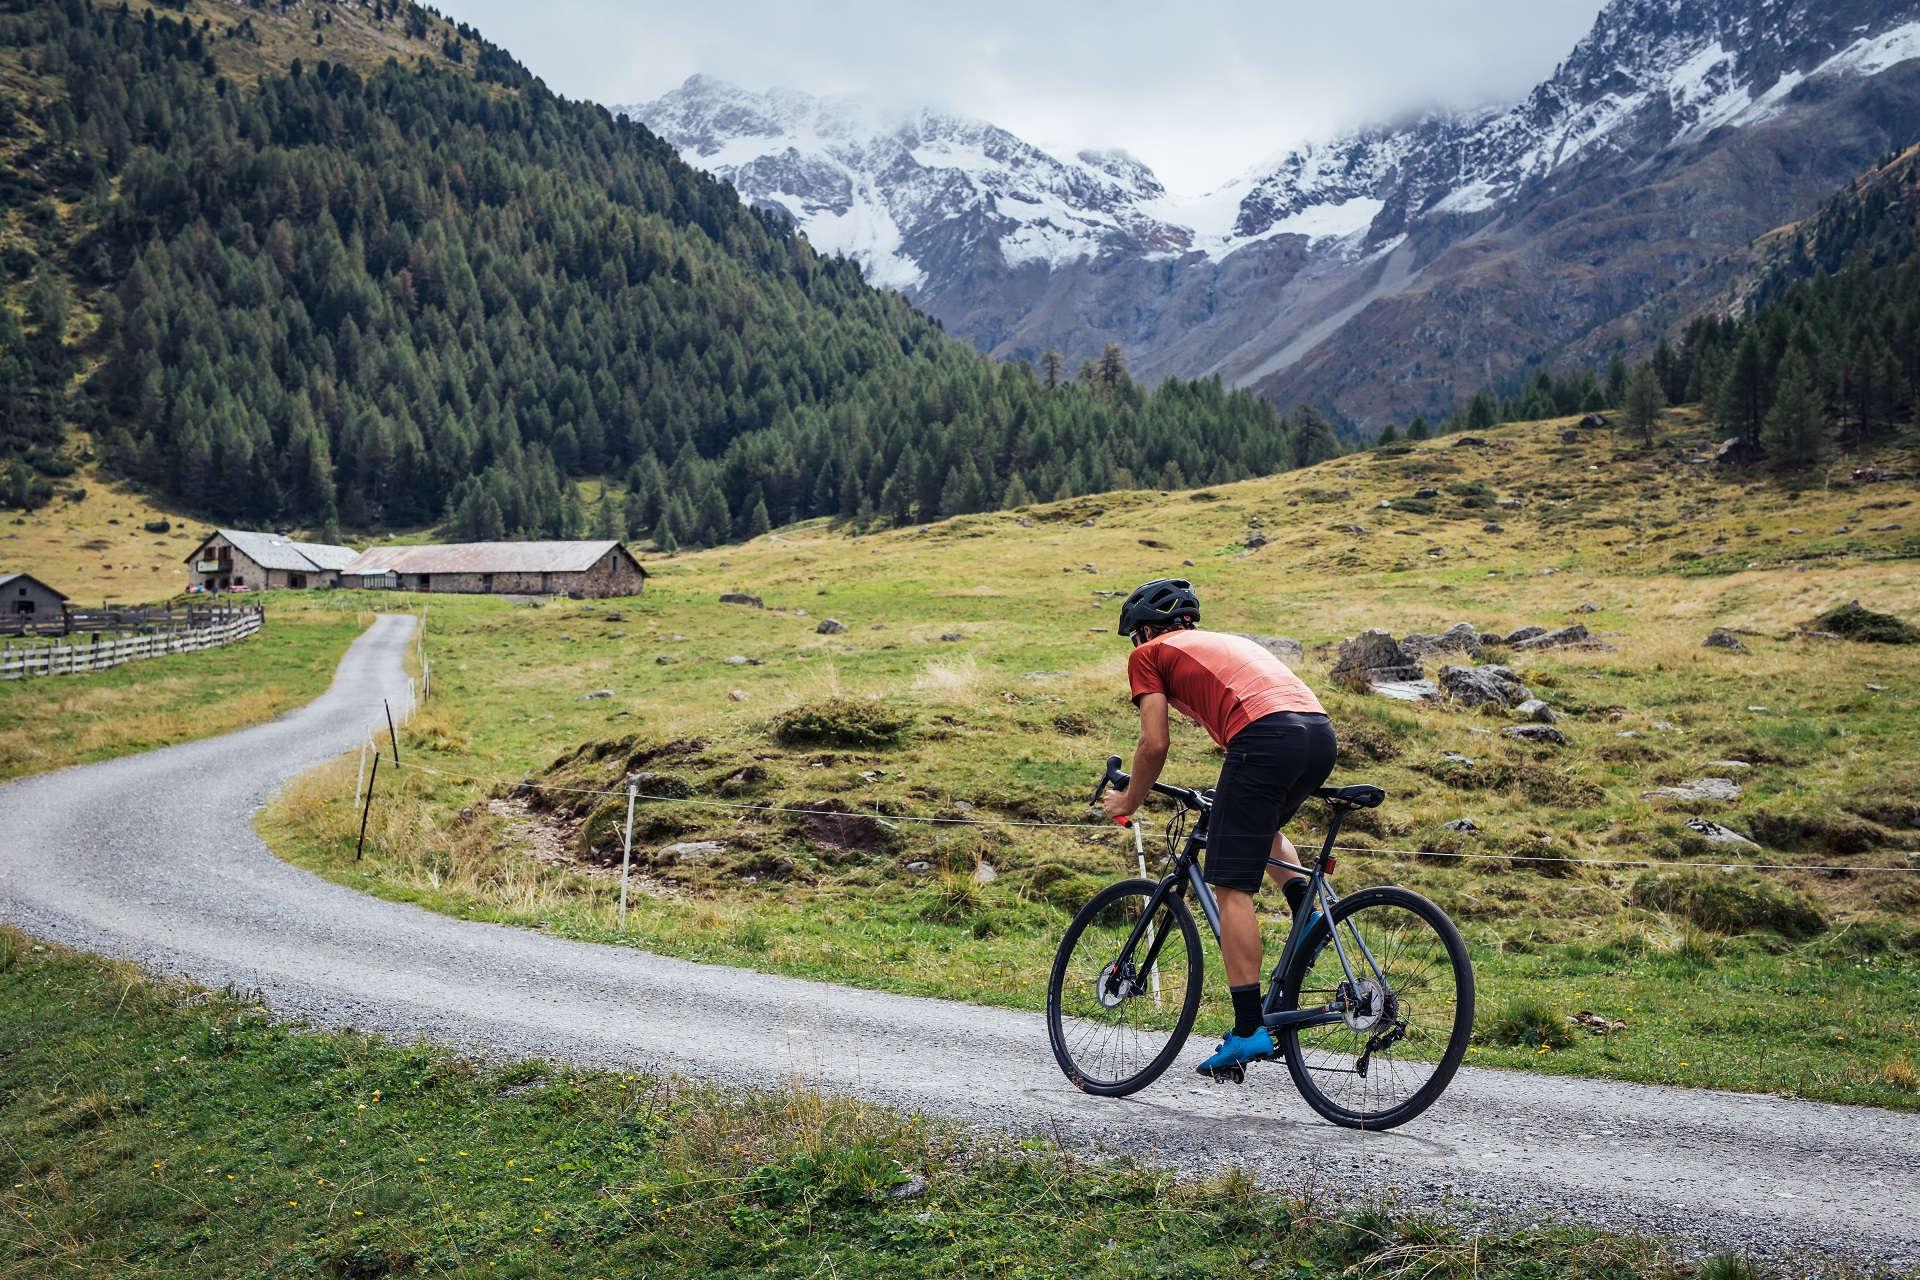 Bulls Cyclocross bike